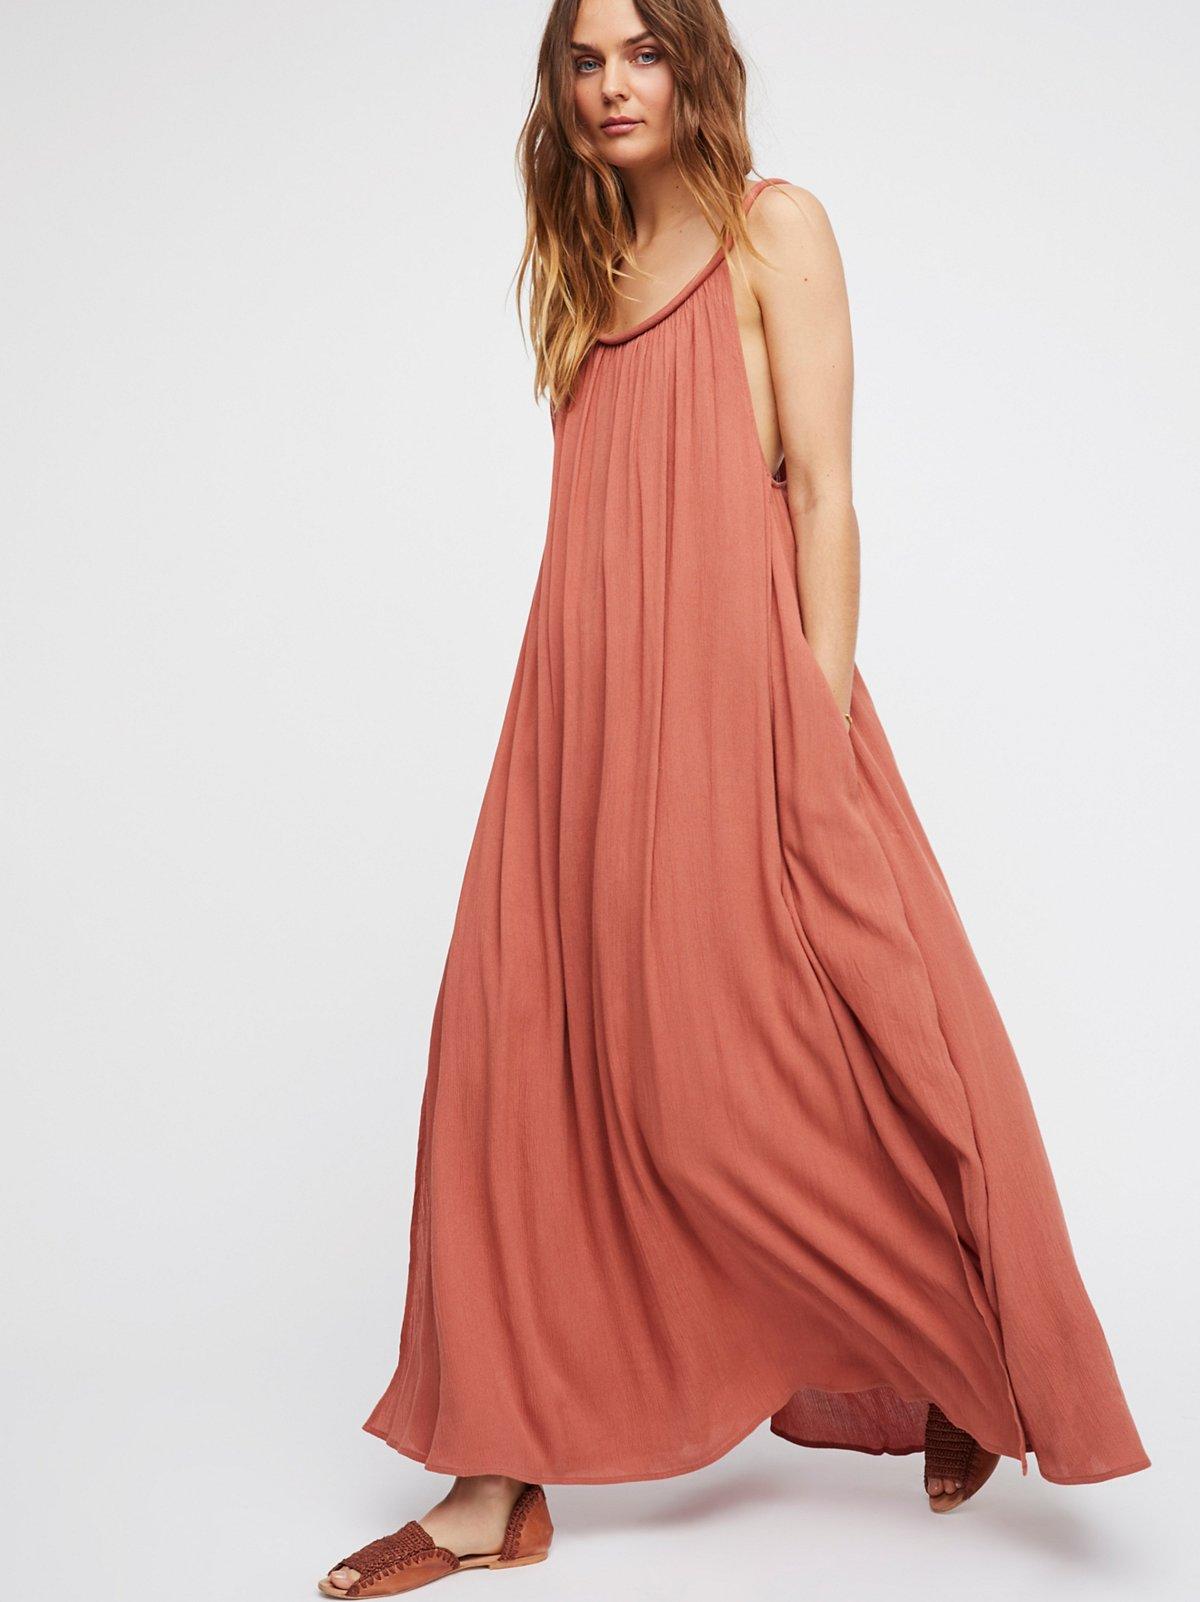 Show Stopper Maxi Dress